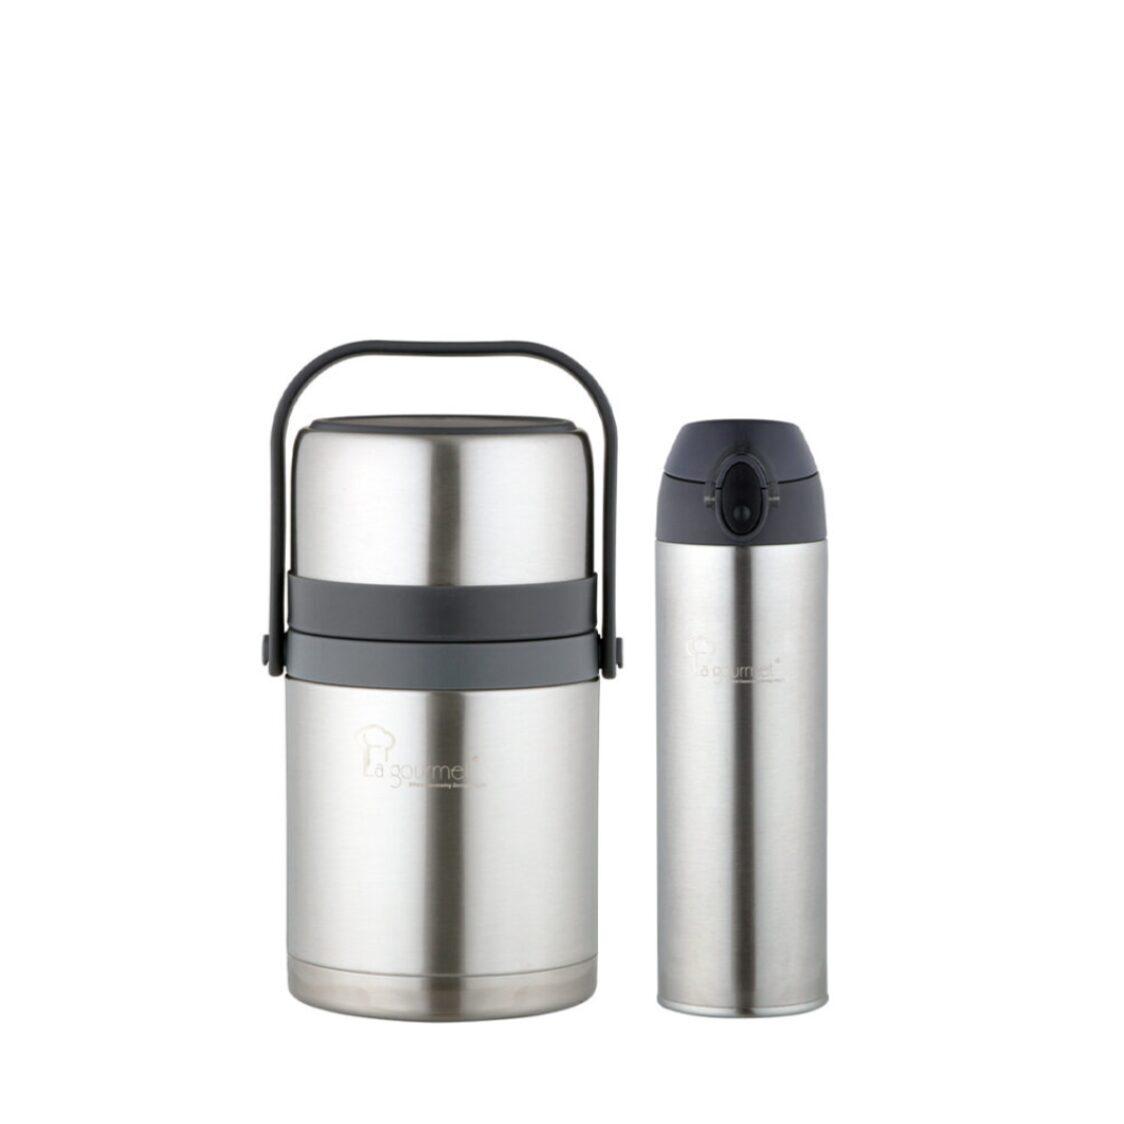 La Gourmet Classic 1L Thermal  Pot  05L Super Light Thermal Flask LGCC350855  LGCC350831